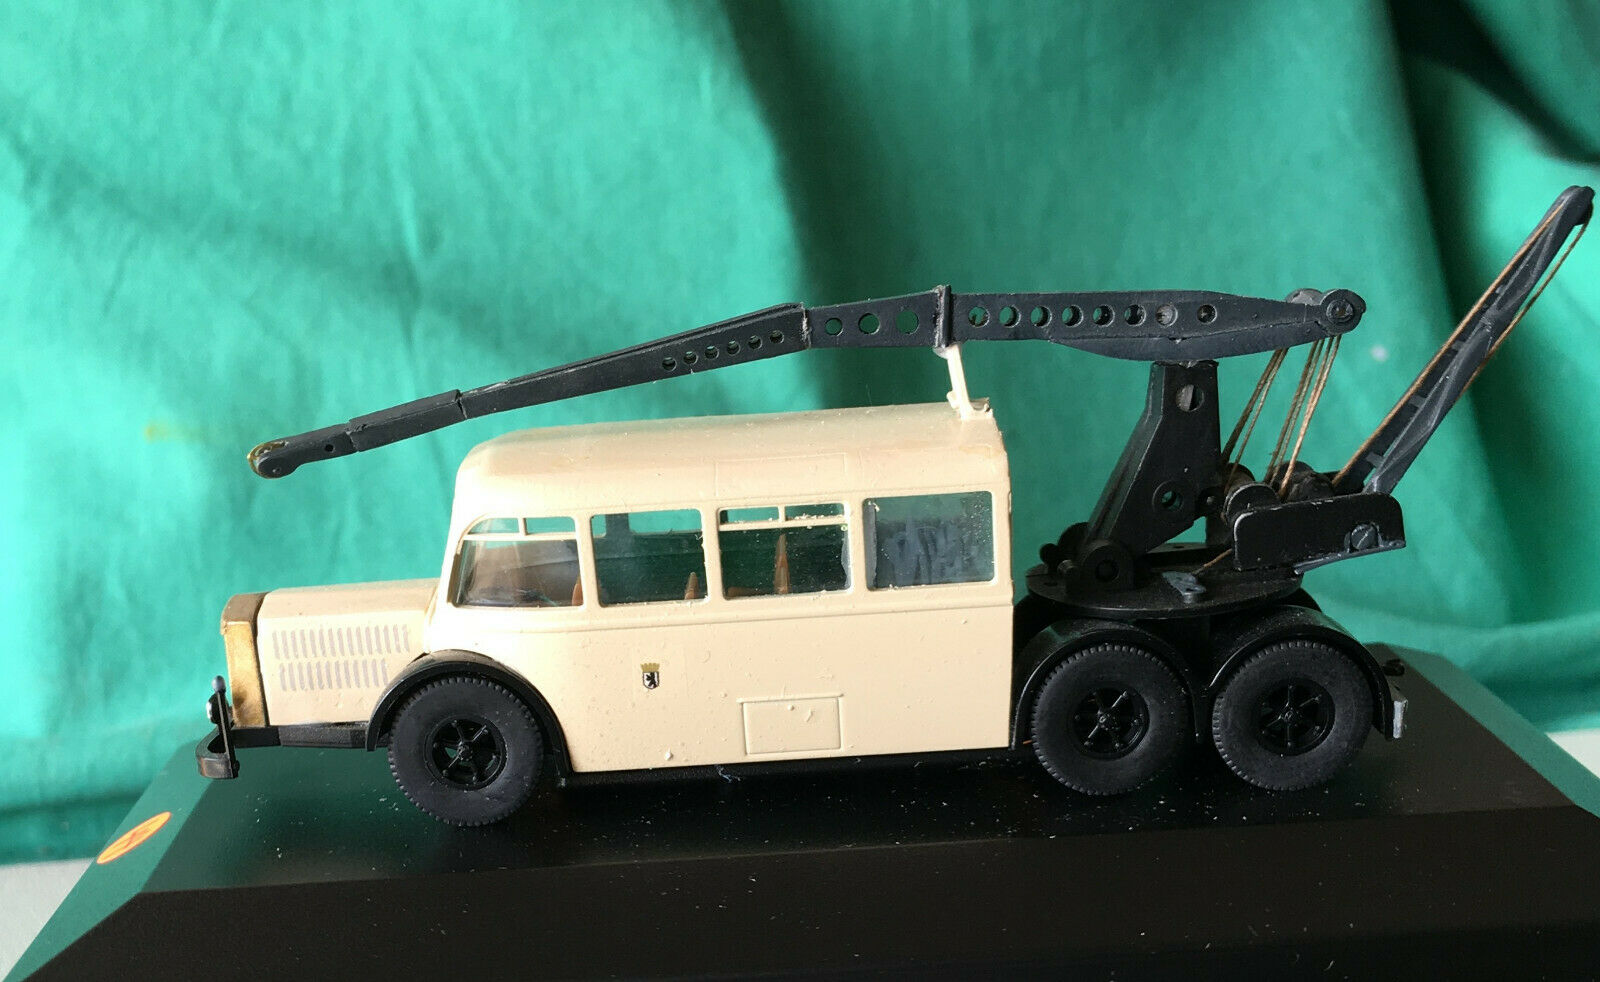 M1  87 Transformation, NAG-Bus, Troll, touwing, grue, restauration,  profiter de vos achats